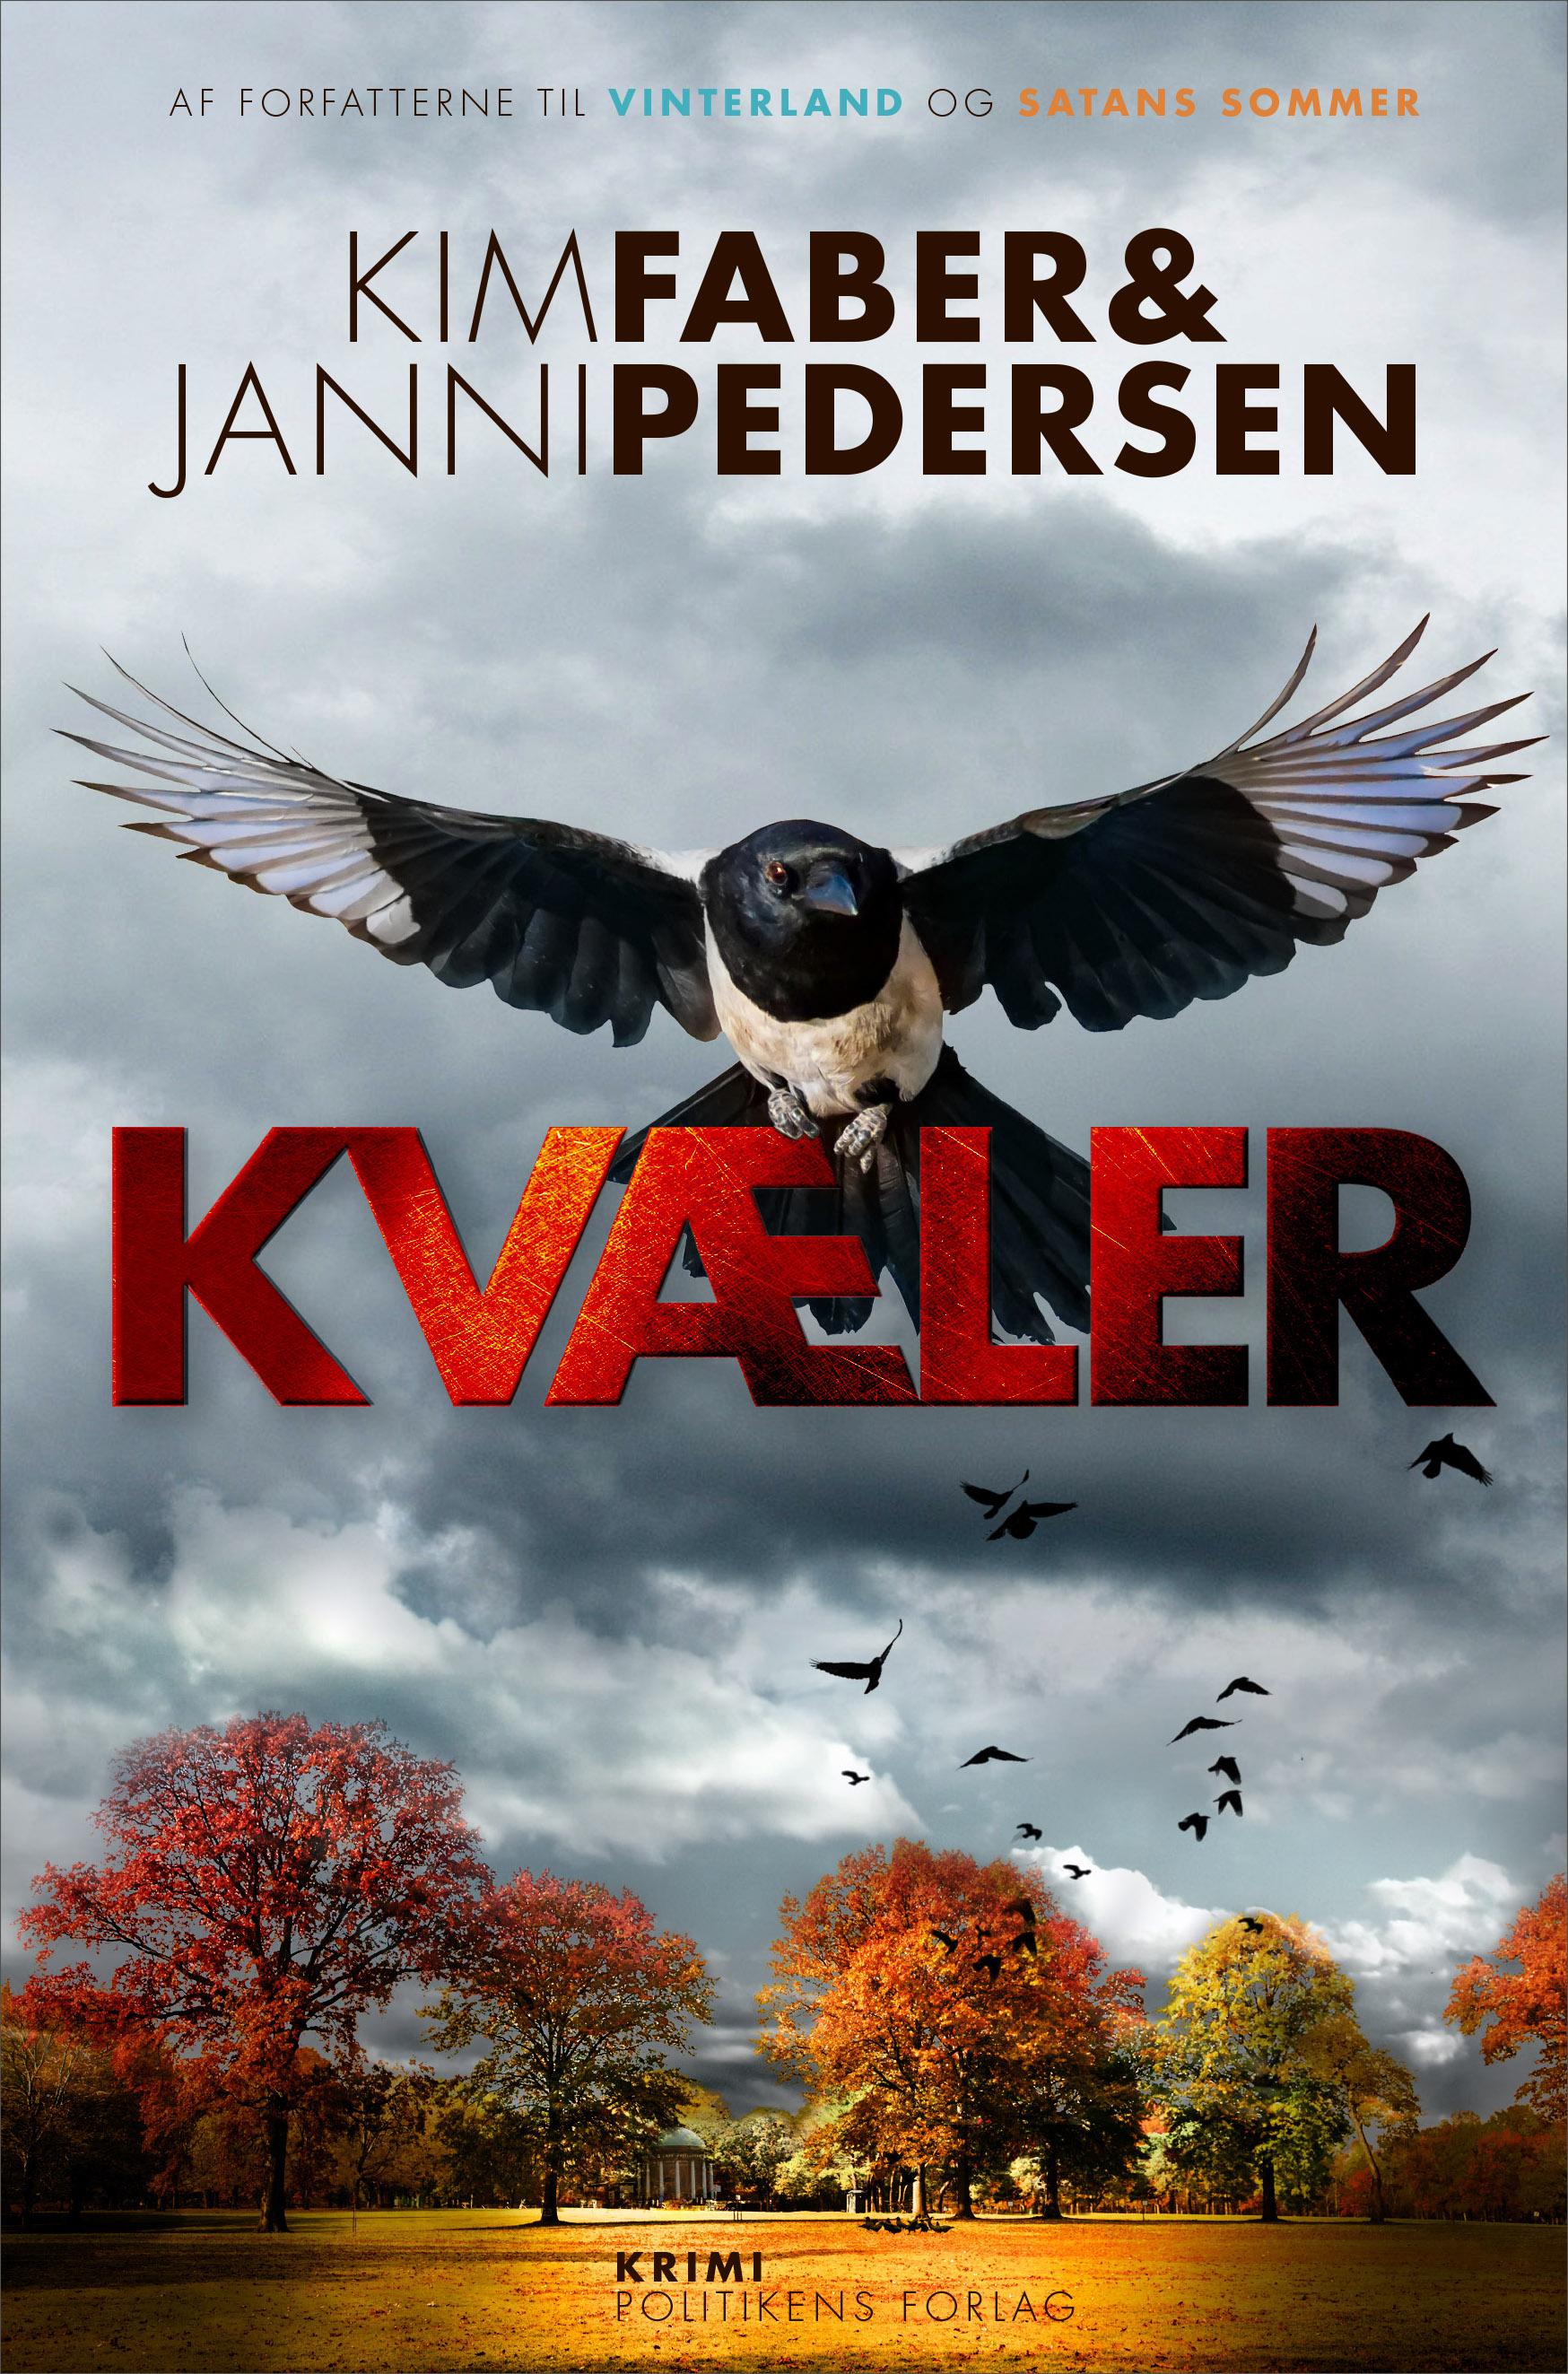 Juncker-serien: Kvæler - Kim Faber & Janni Pedersen - Bøger - Politikens Forlag - 9788740059762 - August 5, 2021